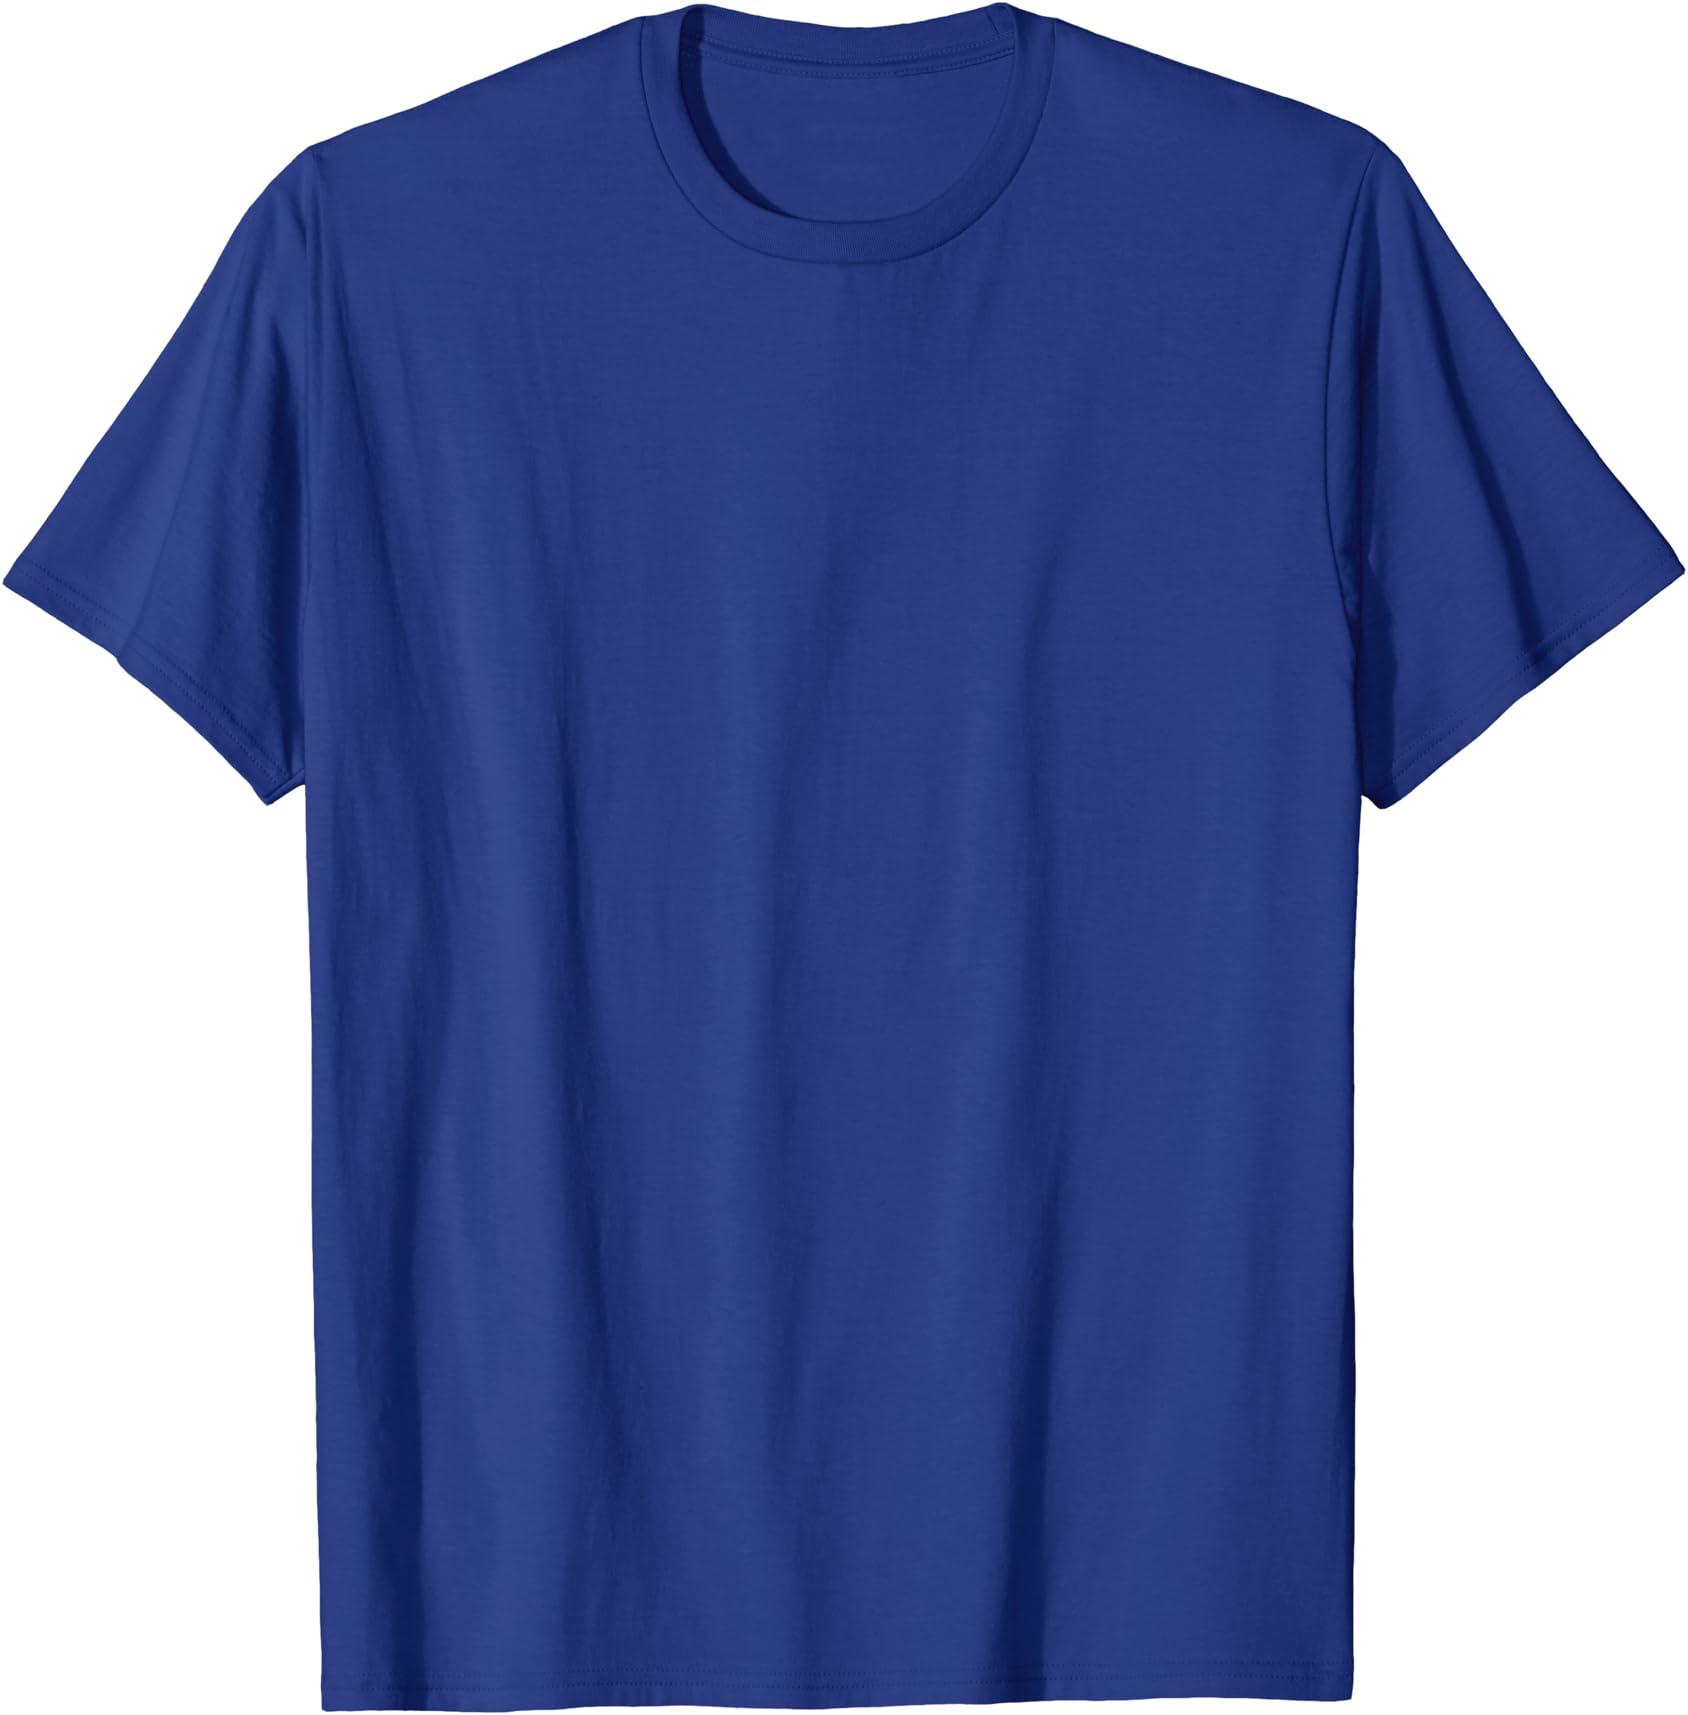 Tenacitee Boys Youth Irish House Heraldry OConnor T-Shirt Large Royal Blue Sligo